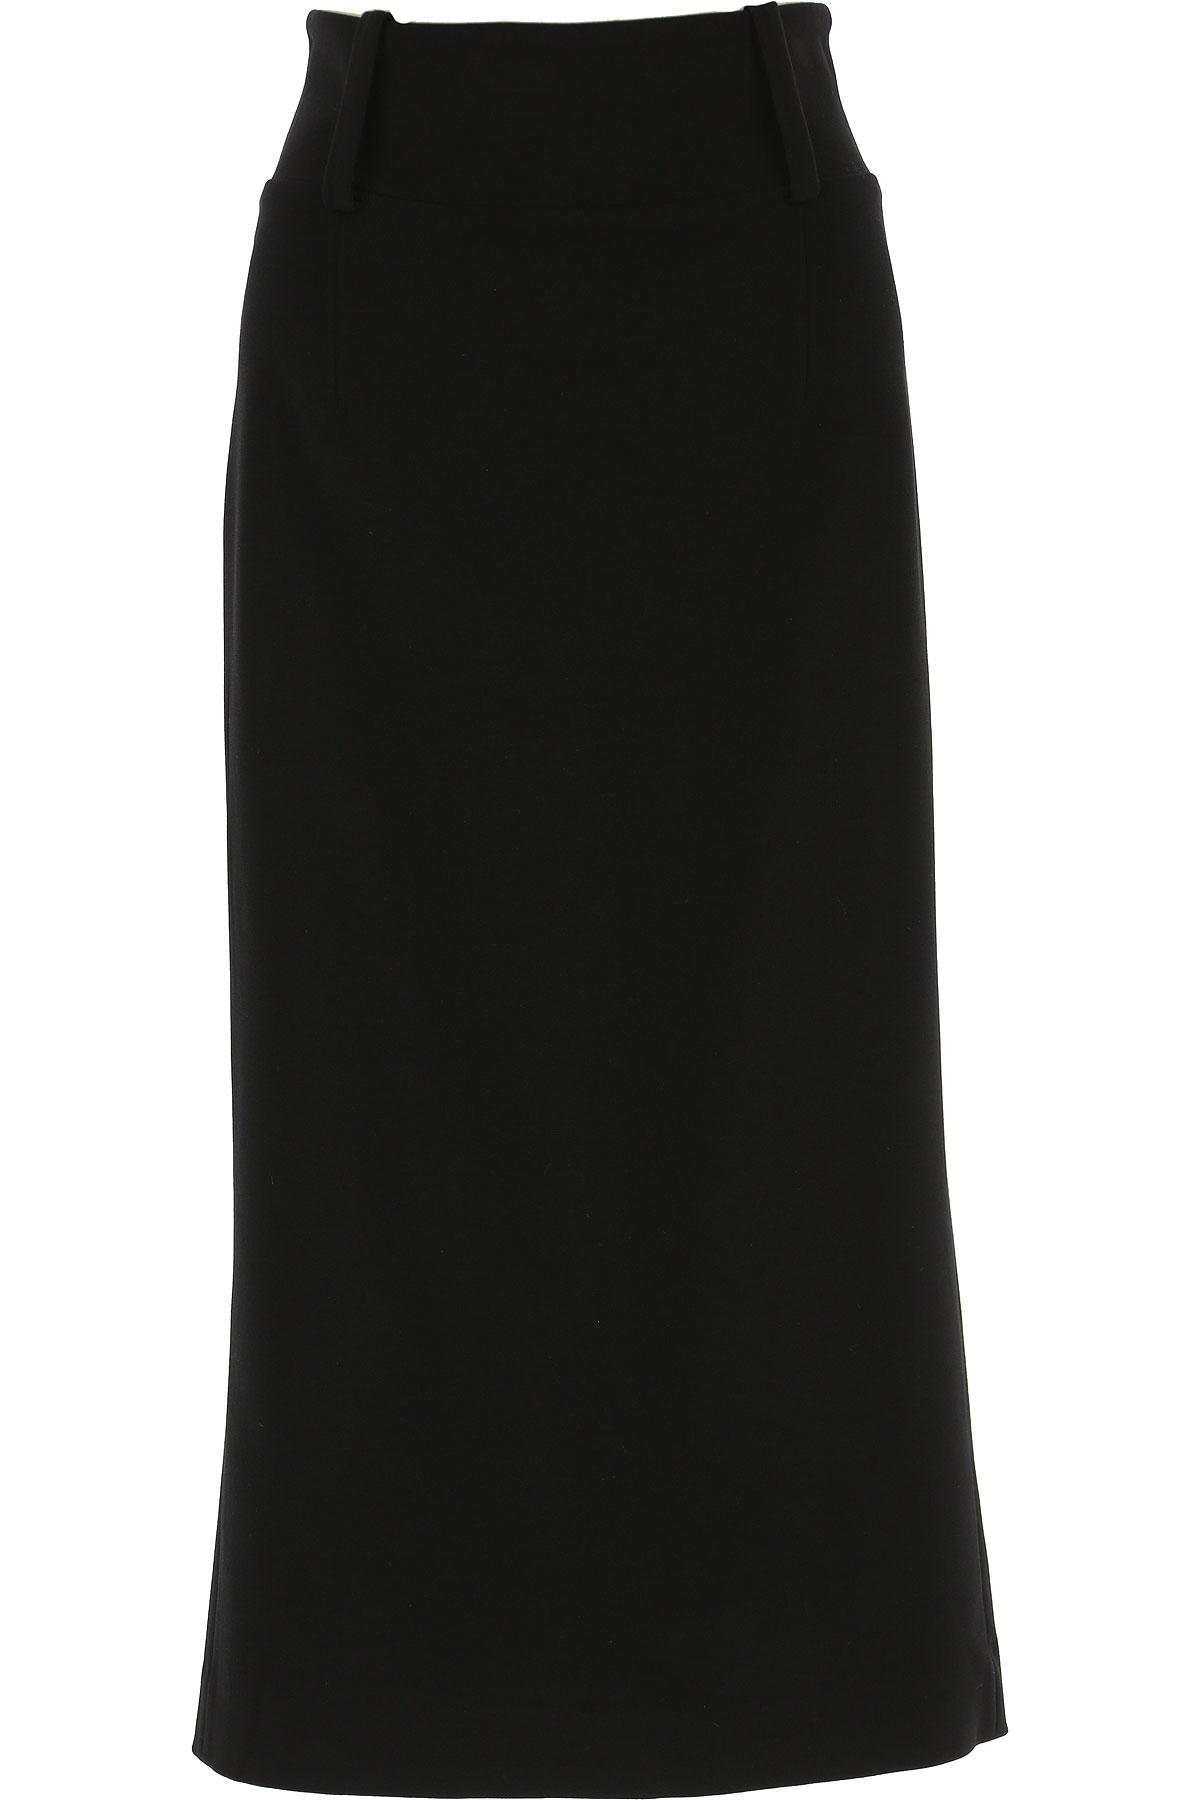 Erika Cavallini Skirt for Women On Sale, Black, viscosa, 2019, 26 28 30